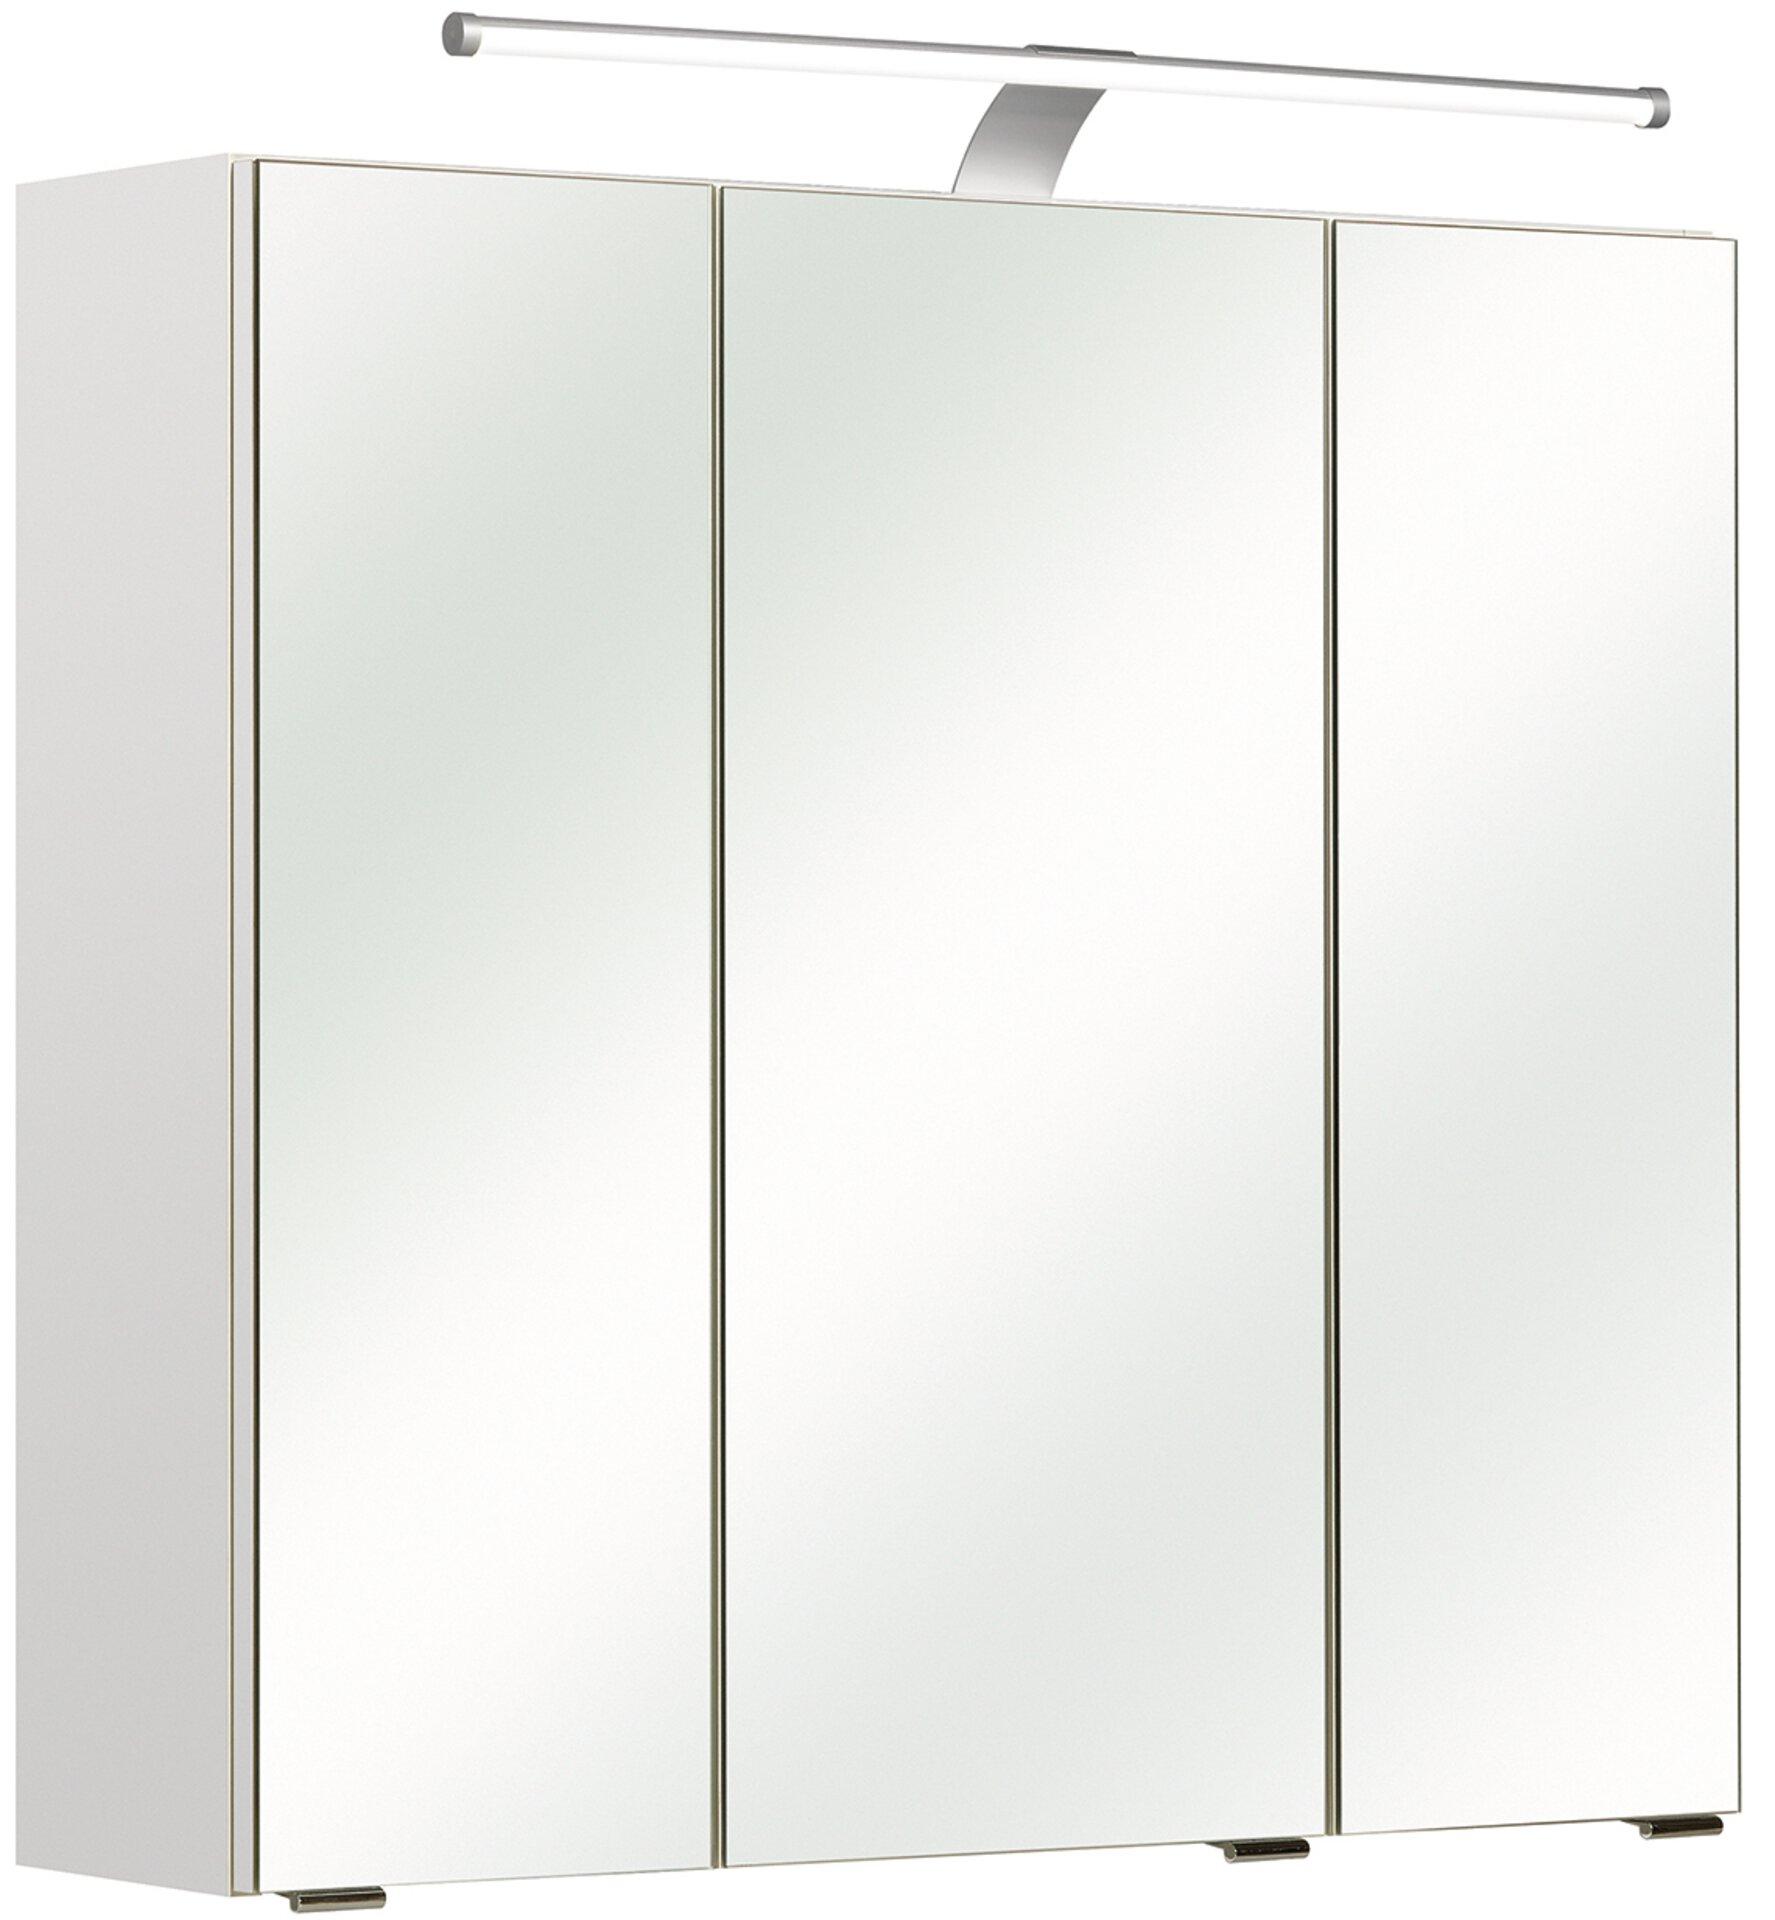 Spiegelschrank Ascoli I PELIPAL Holzwerkstoff weiß